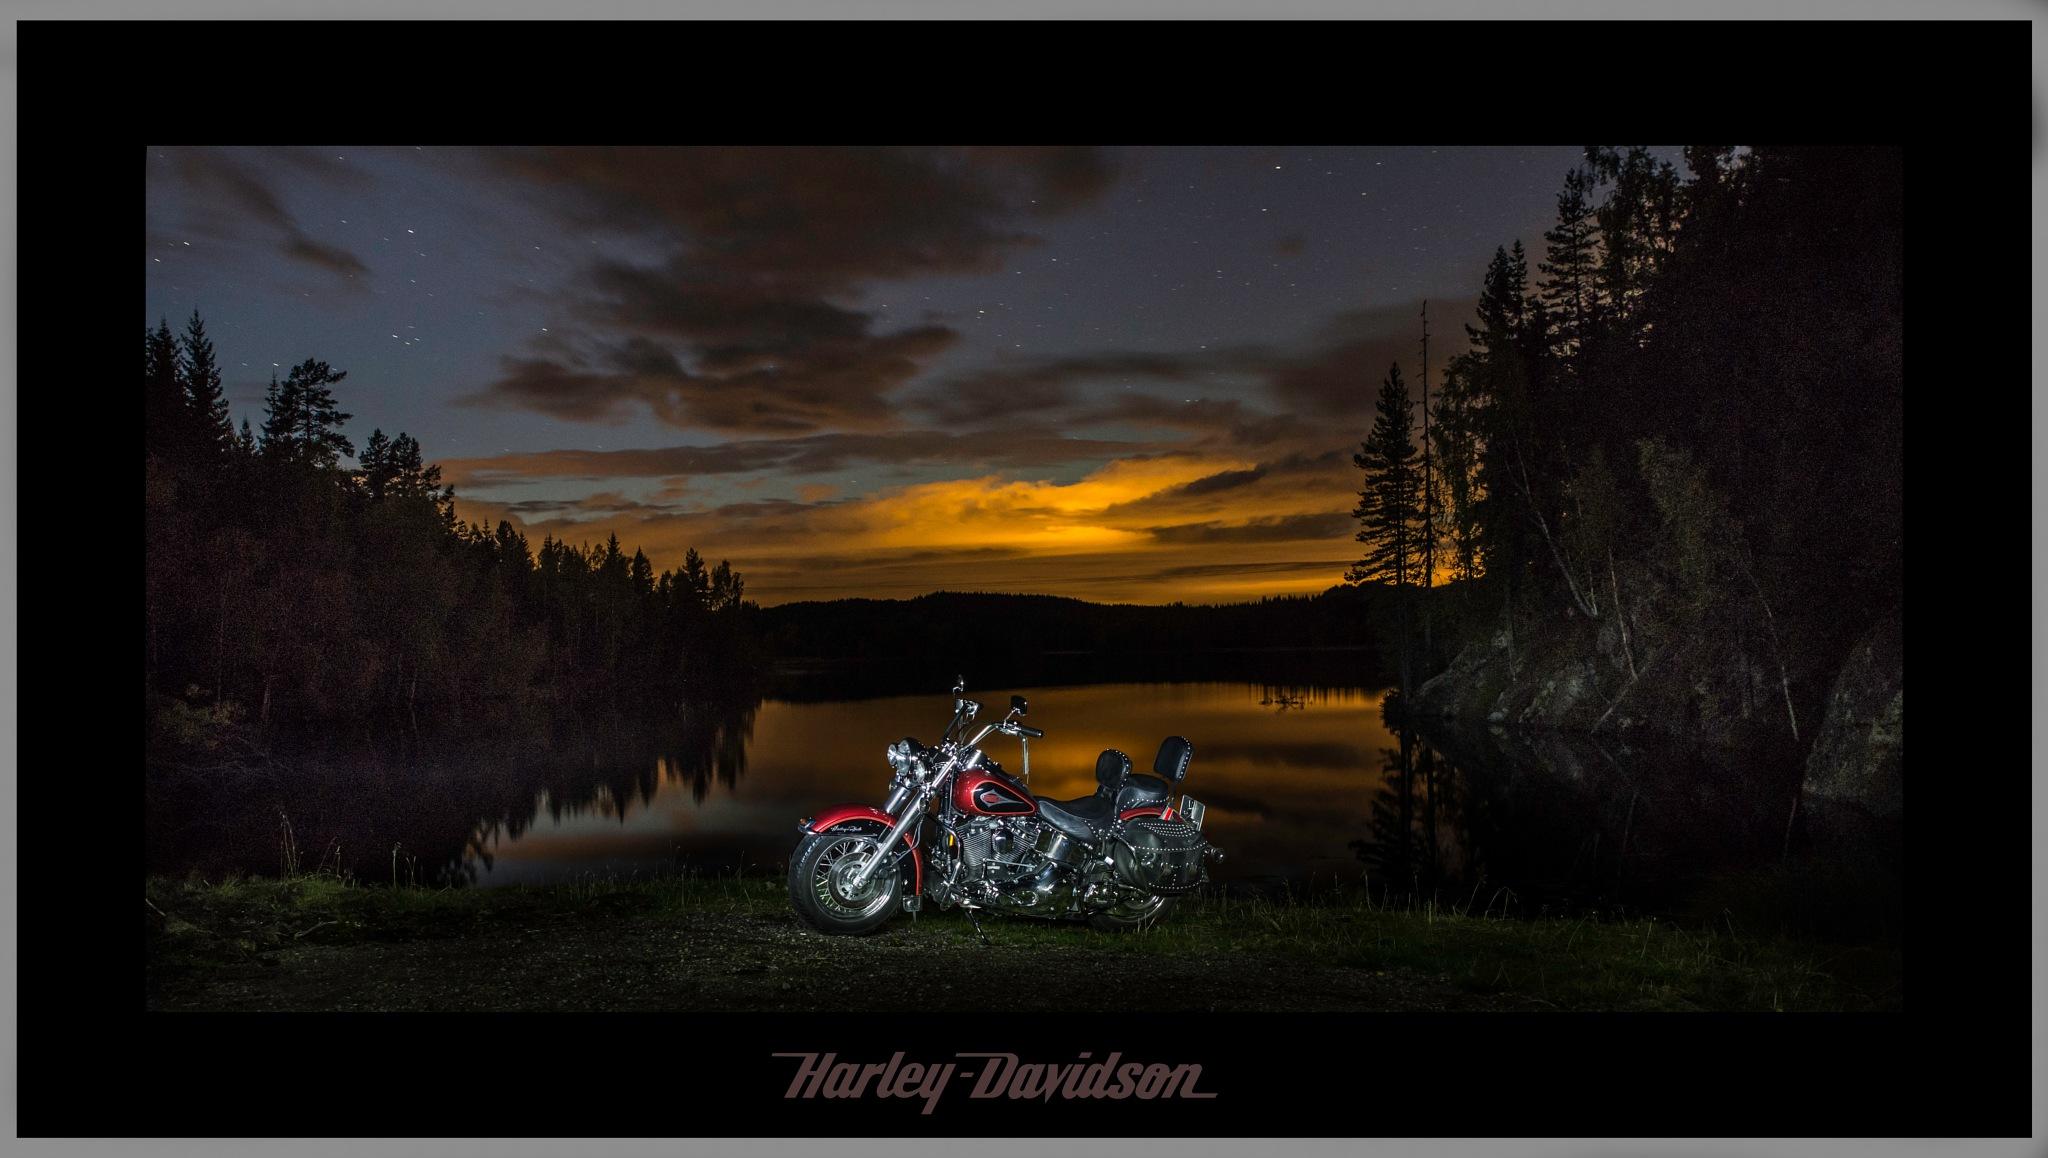 Harley Davidson by Kristen Tande